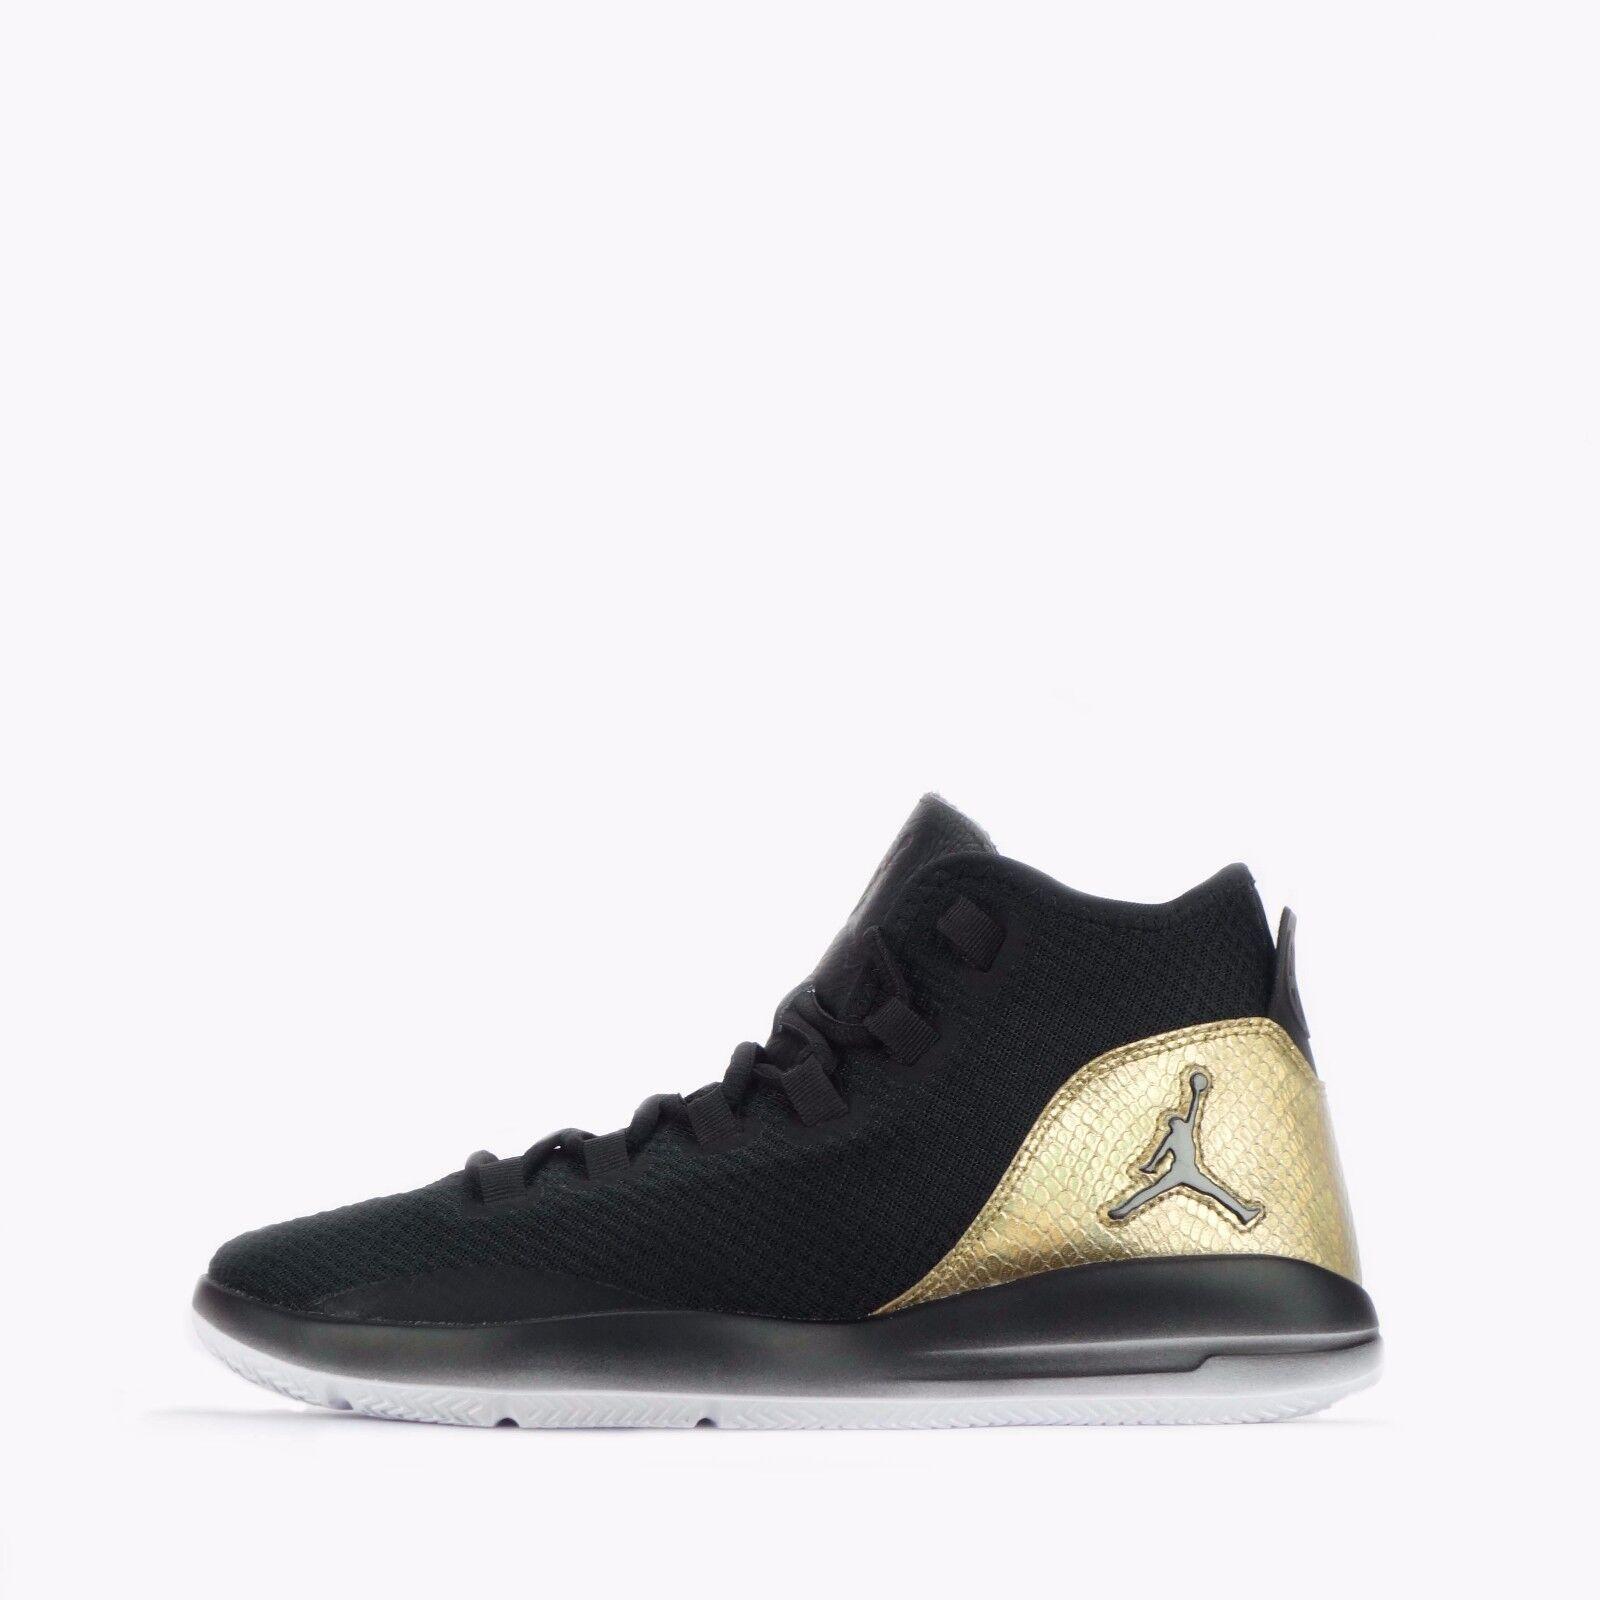 Nike Jordan Reveal Q54 Men's Trainers Black/Metallic Gold